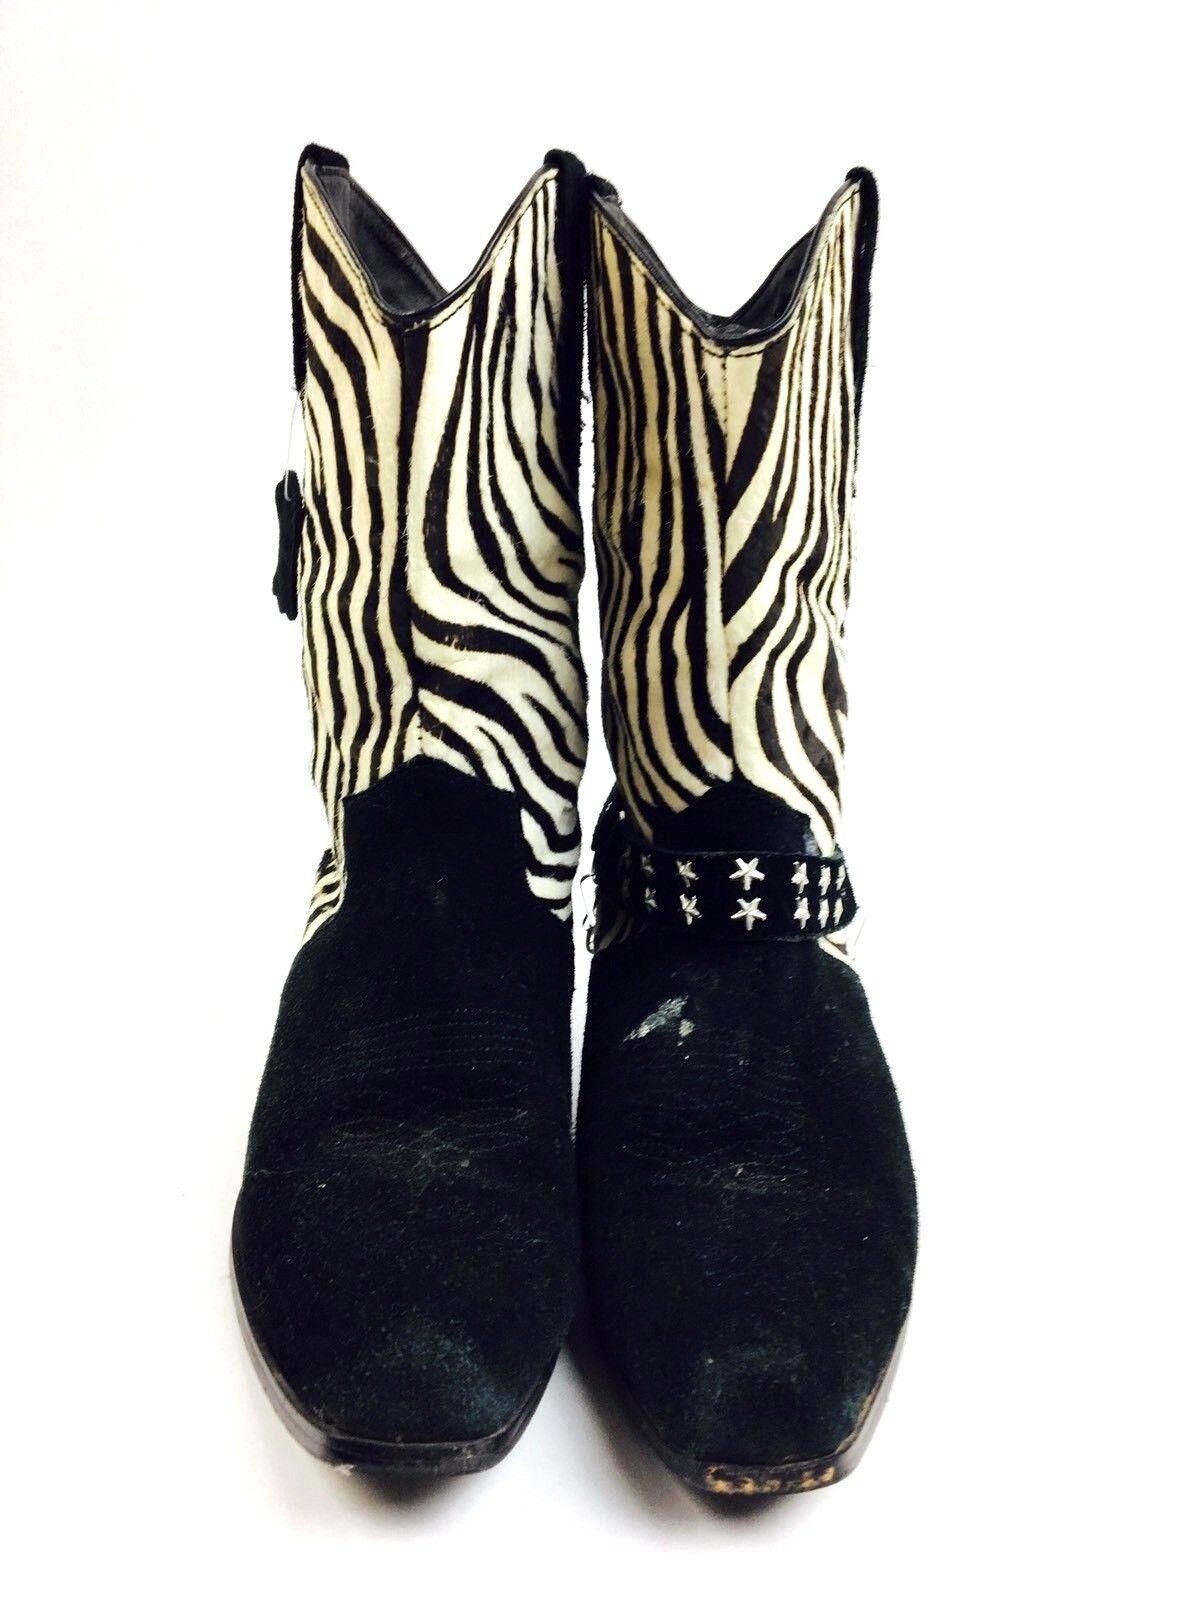 Zebra Cowboy Boots Women's Shoes Women's Boots He… - image 4